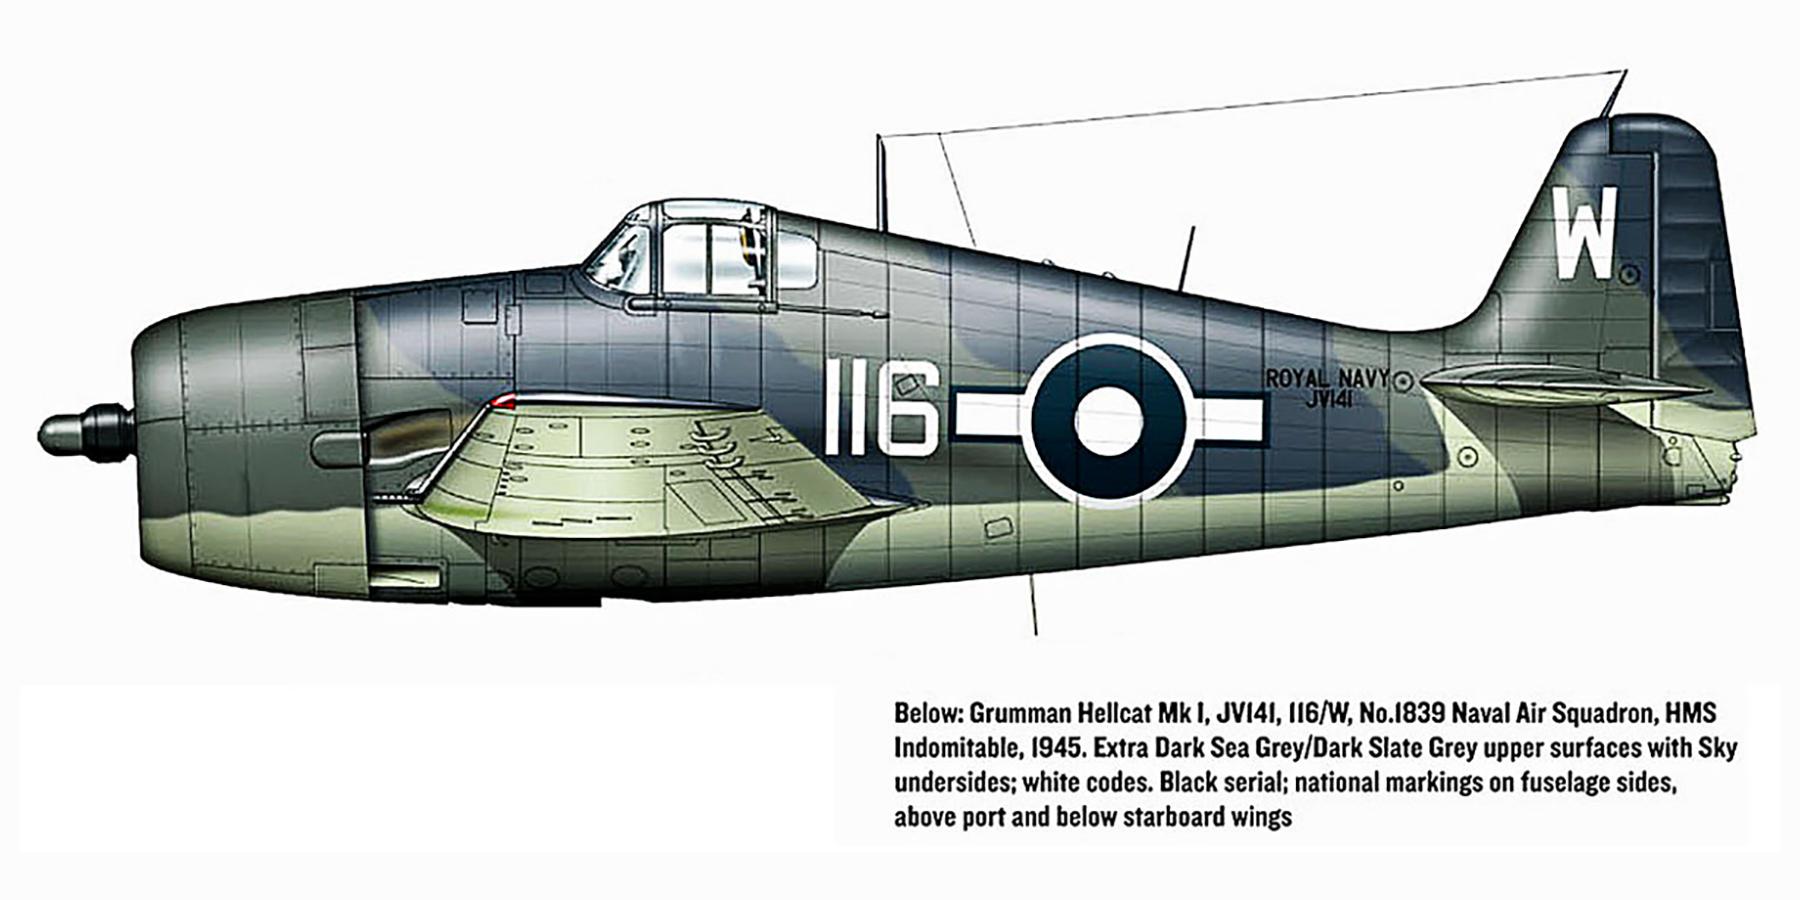 Grumman Hellcat MkI RN FAA 1839NAS W116 JV141 HMS Indomitable 1945 0A